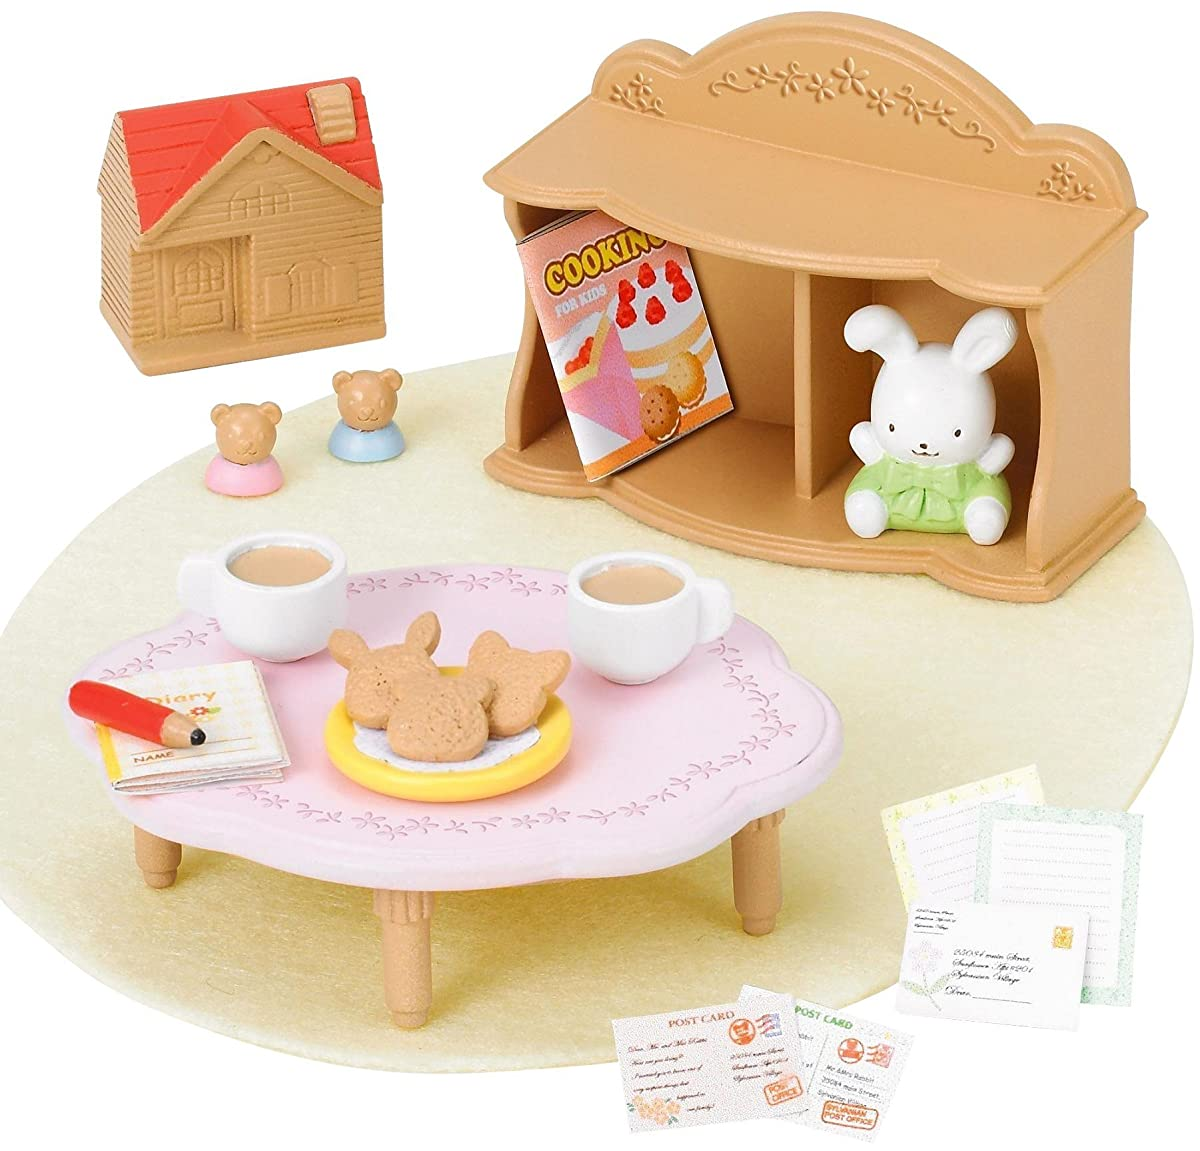 1:12 Mini Goddess Statue For Miniature Dollhouse Accessory Home Decor DIY Gift、